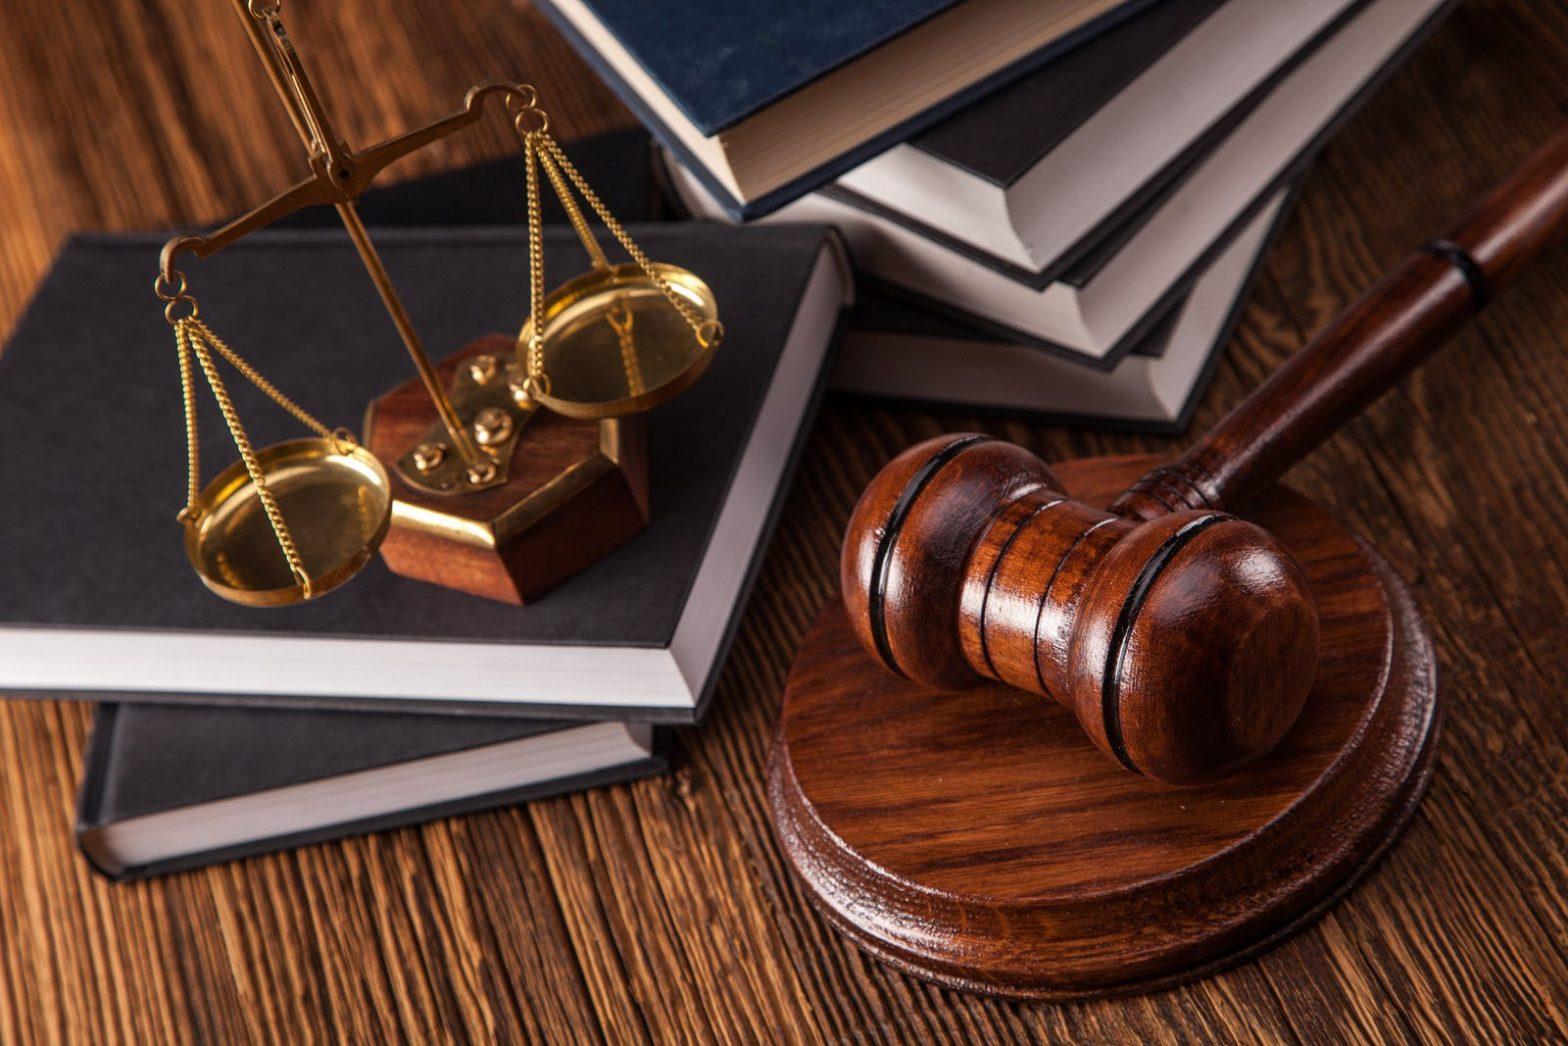 Viele Rechtsgebiete